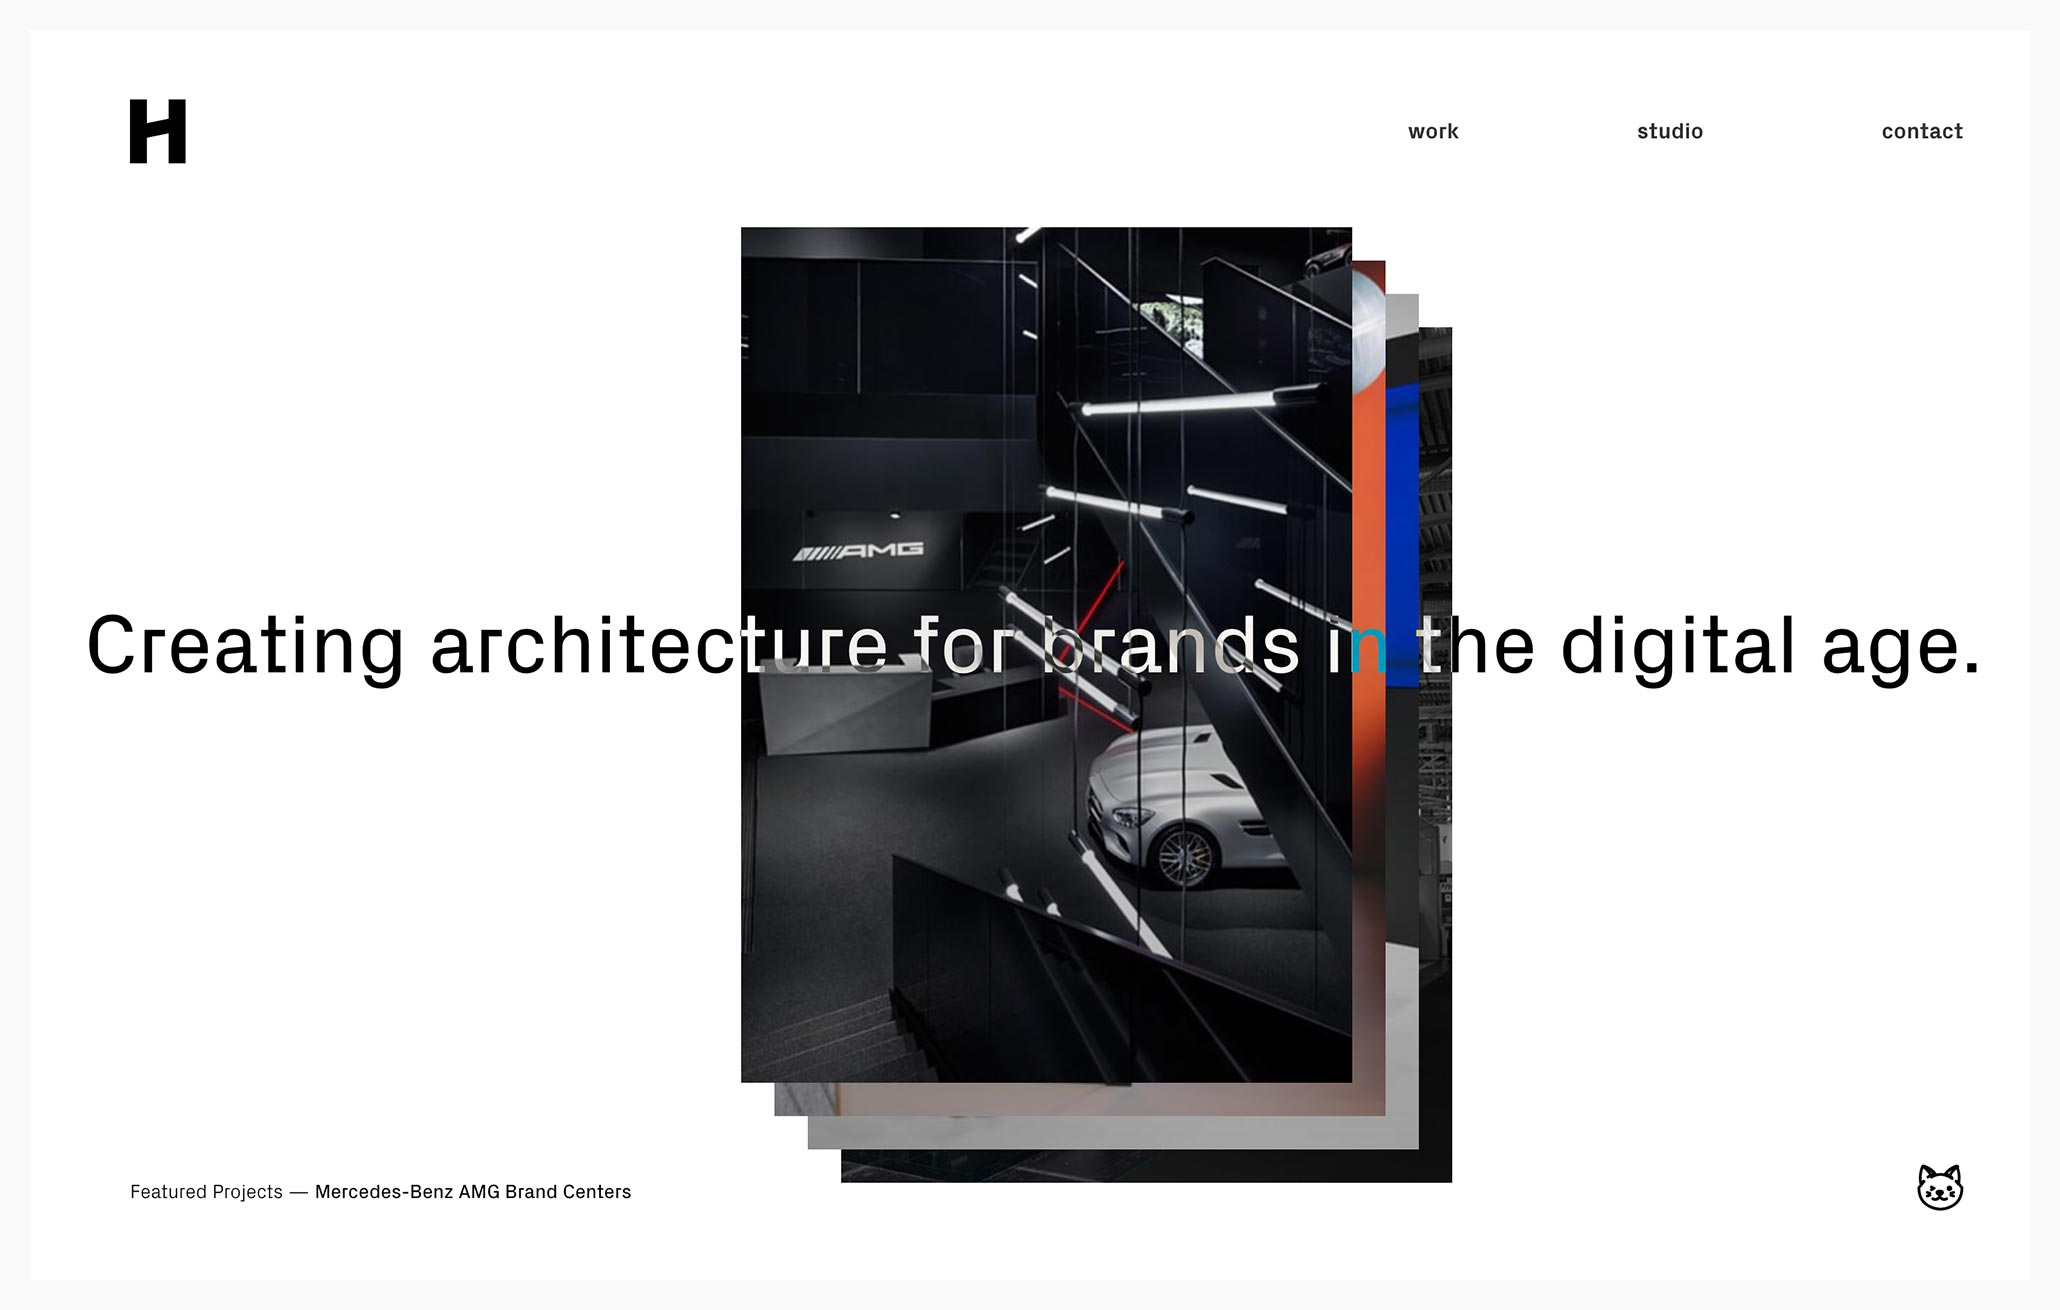 Heller - Best Architecture Website of 2019